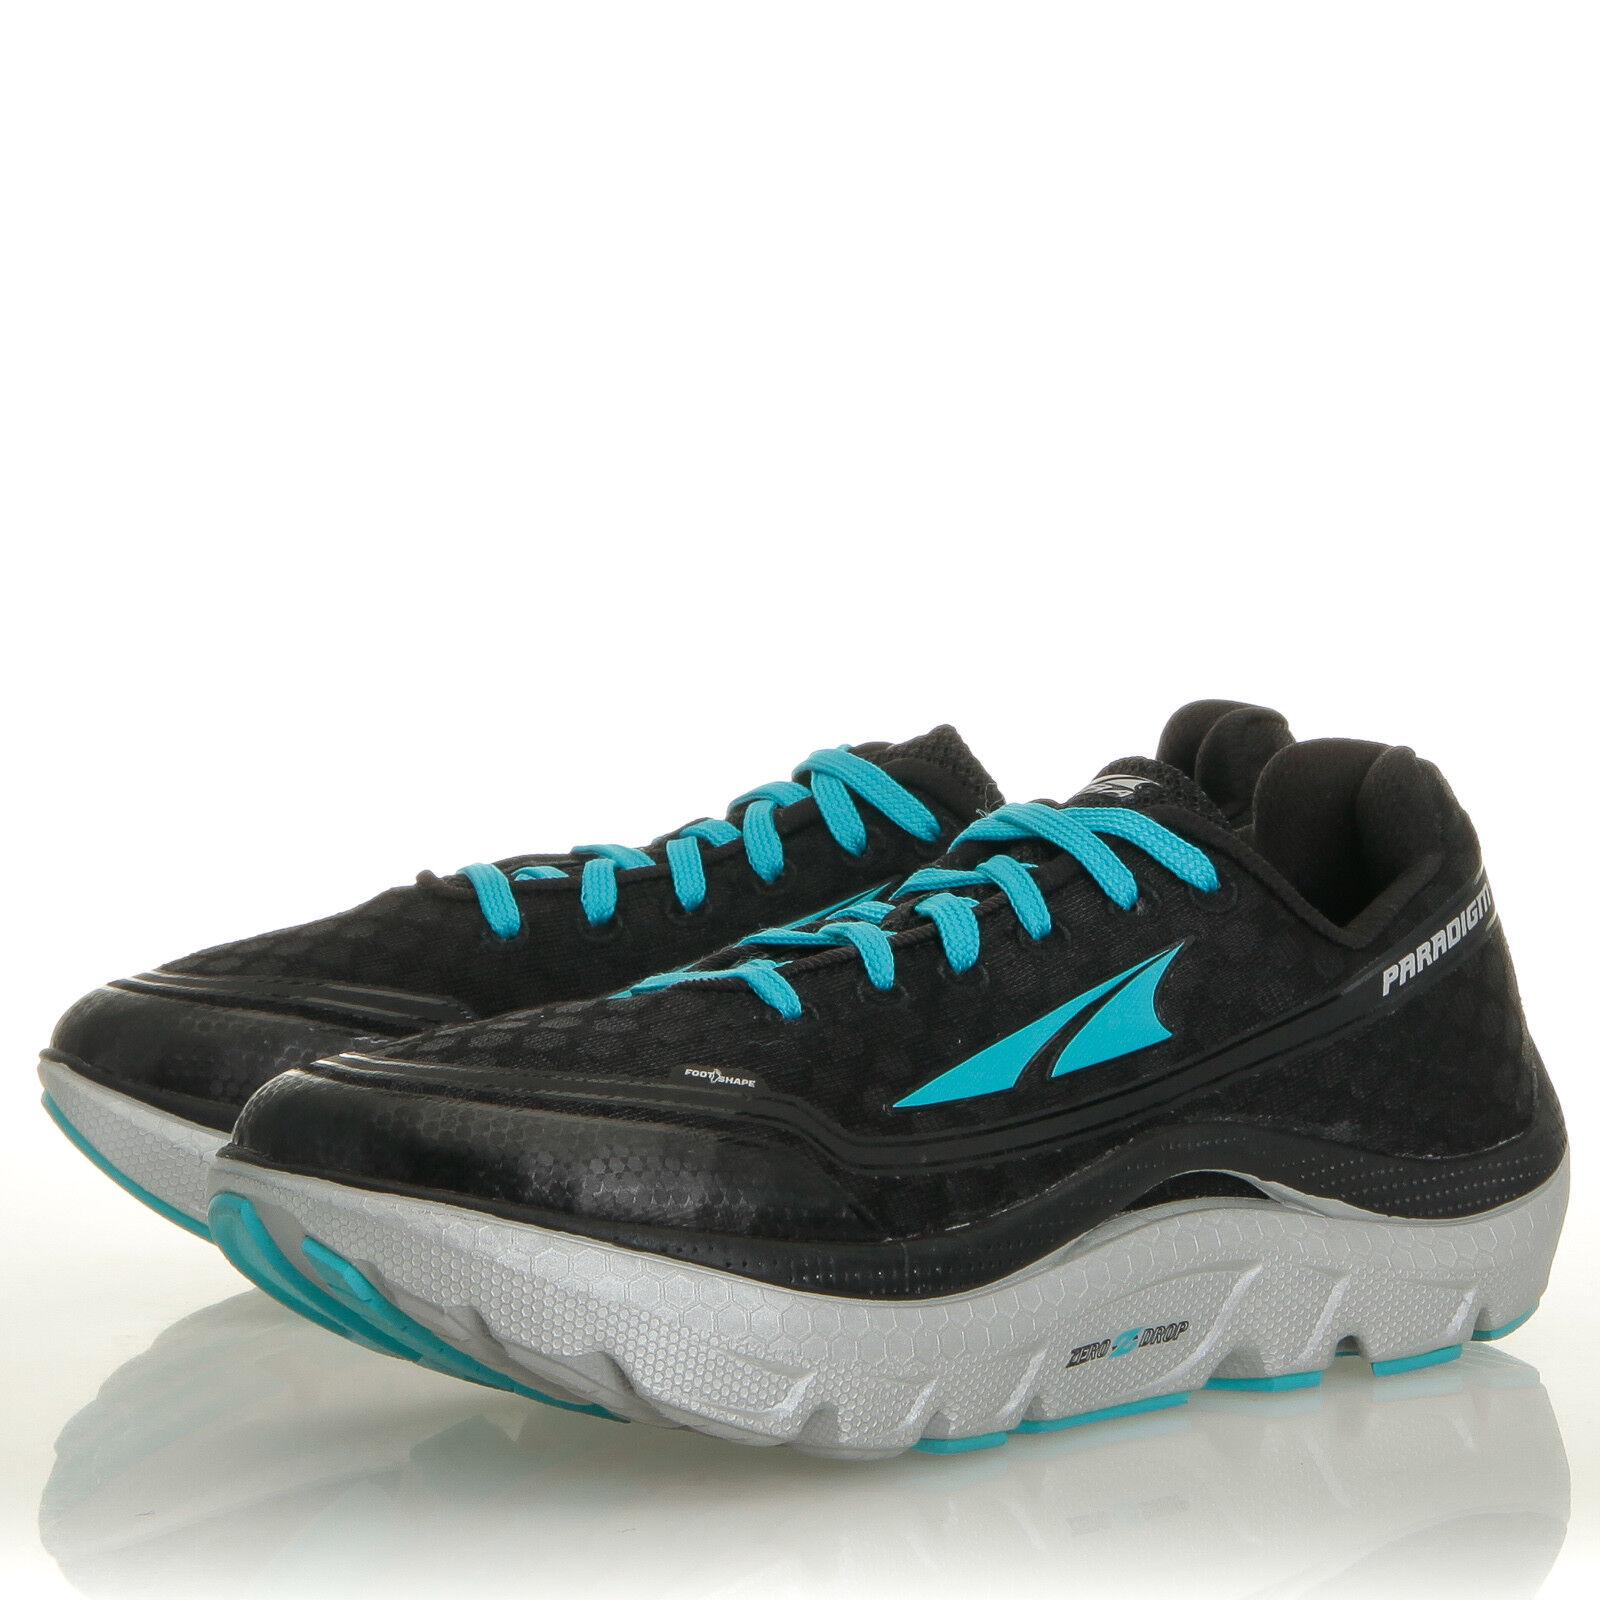 Altra Altra Altra paradigma de caída cero 1.5 Negro Azul Calzado para Correr-Para Mujer 7  descuento de ventas en línea